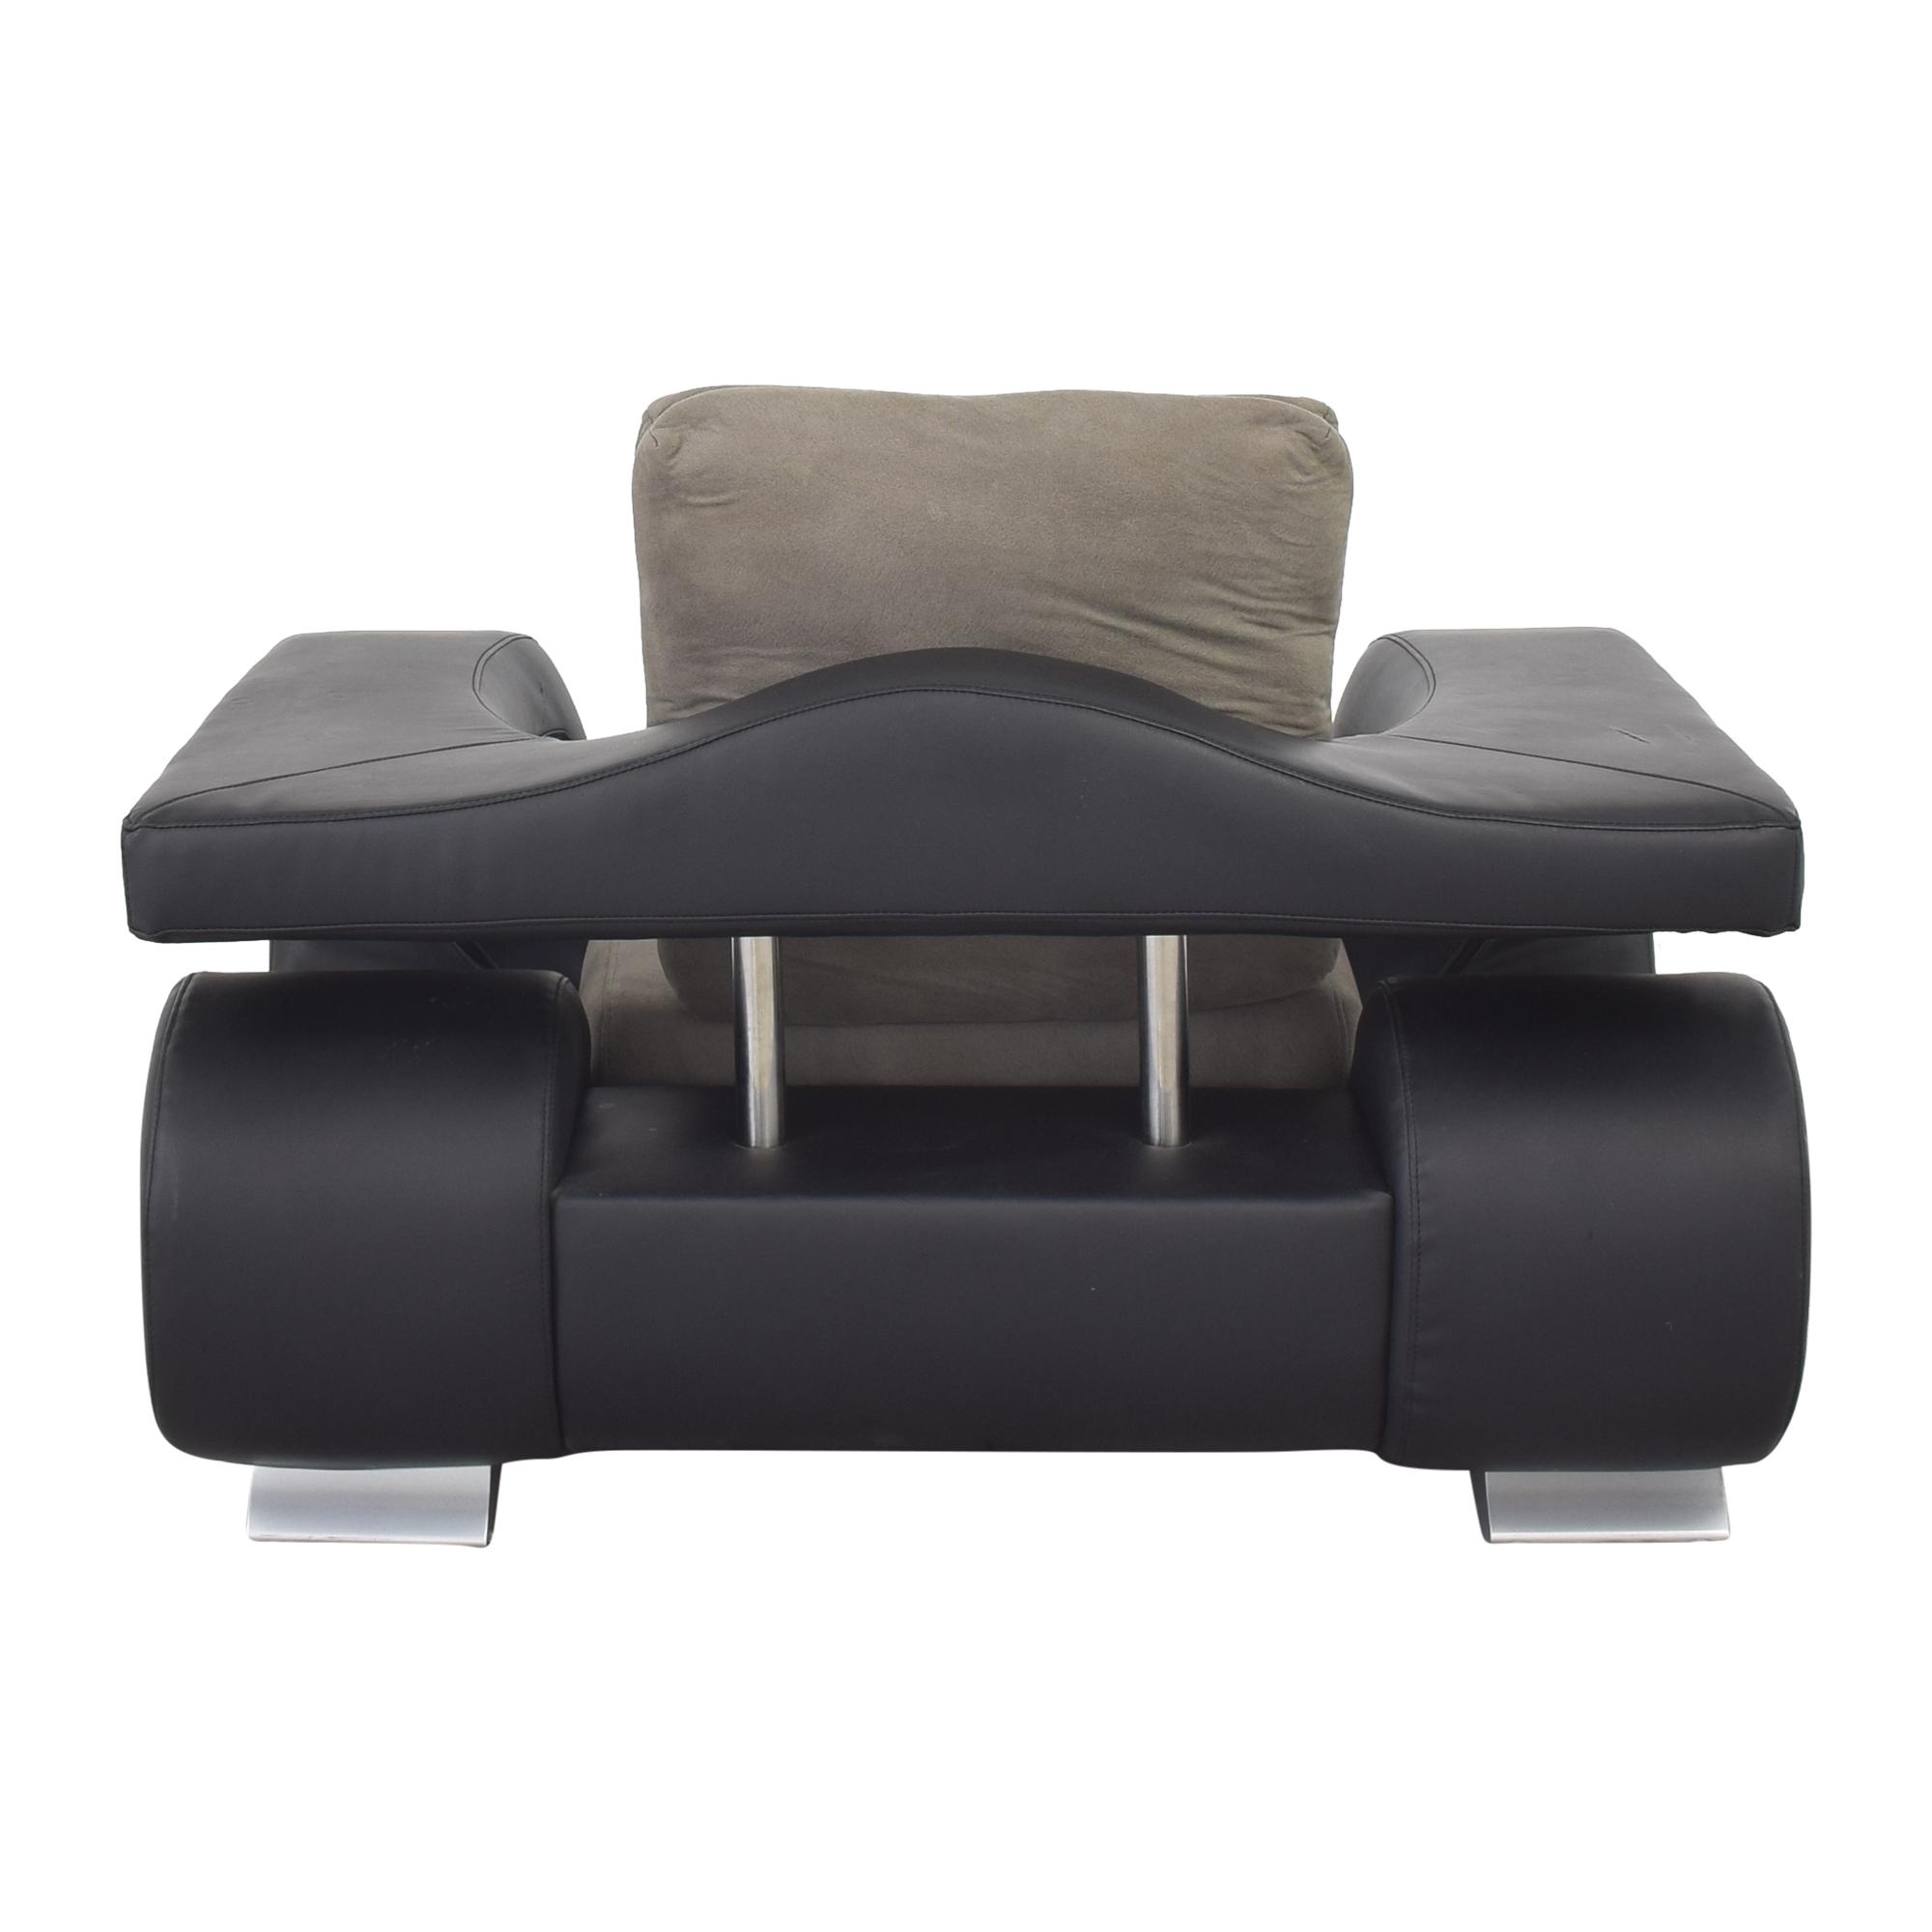 Acme Acme Modern Style Lounge Chair price